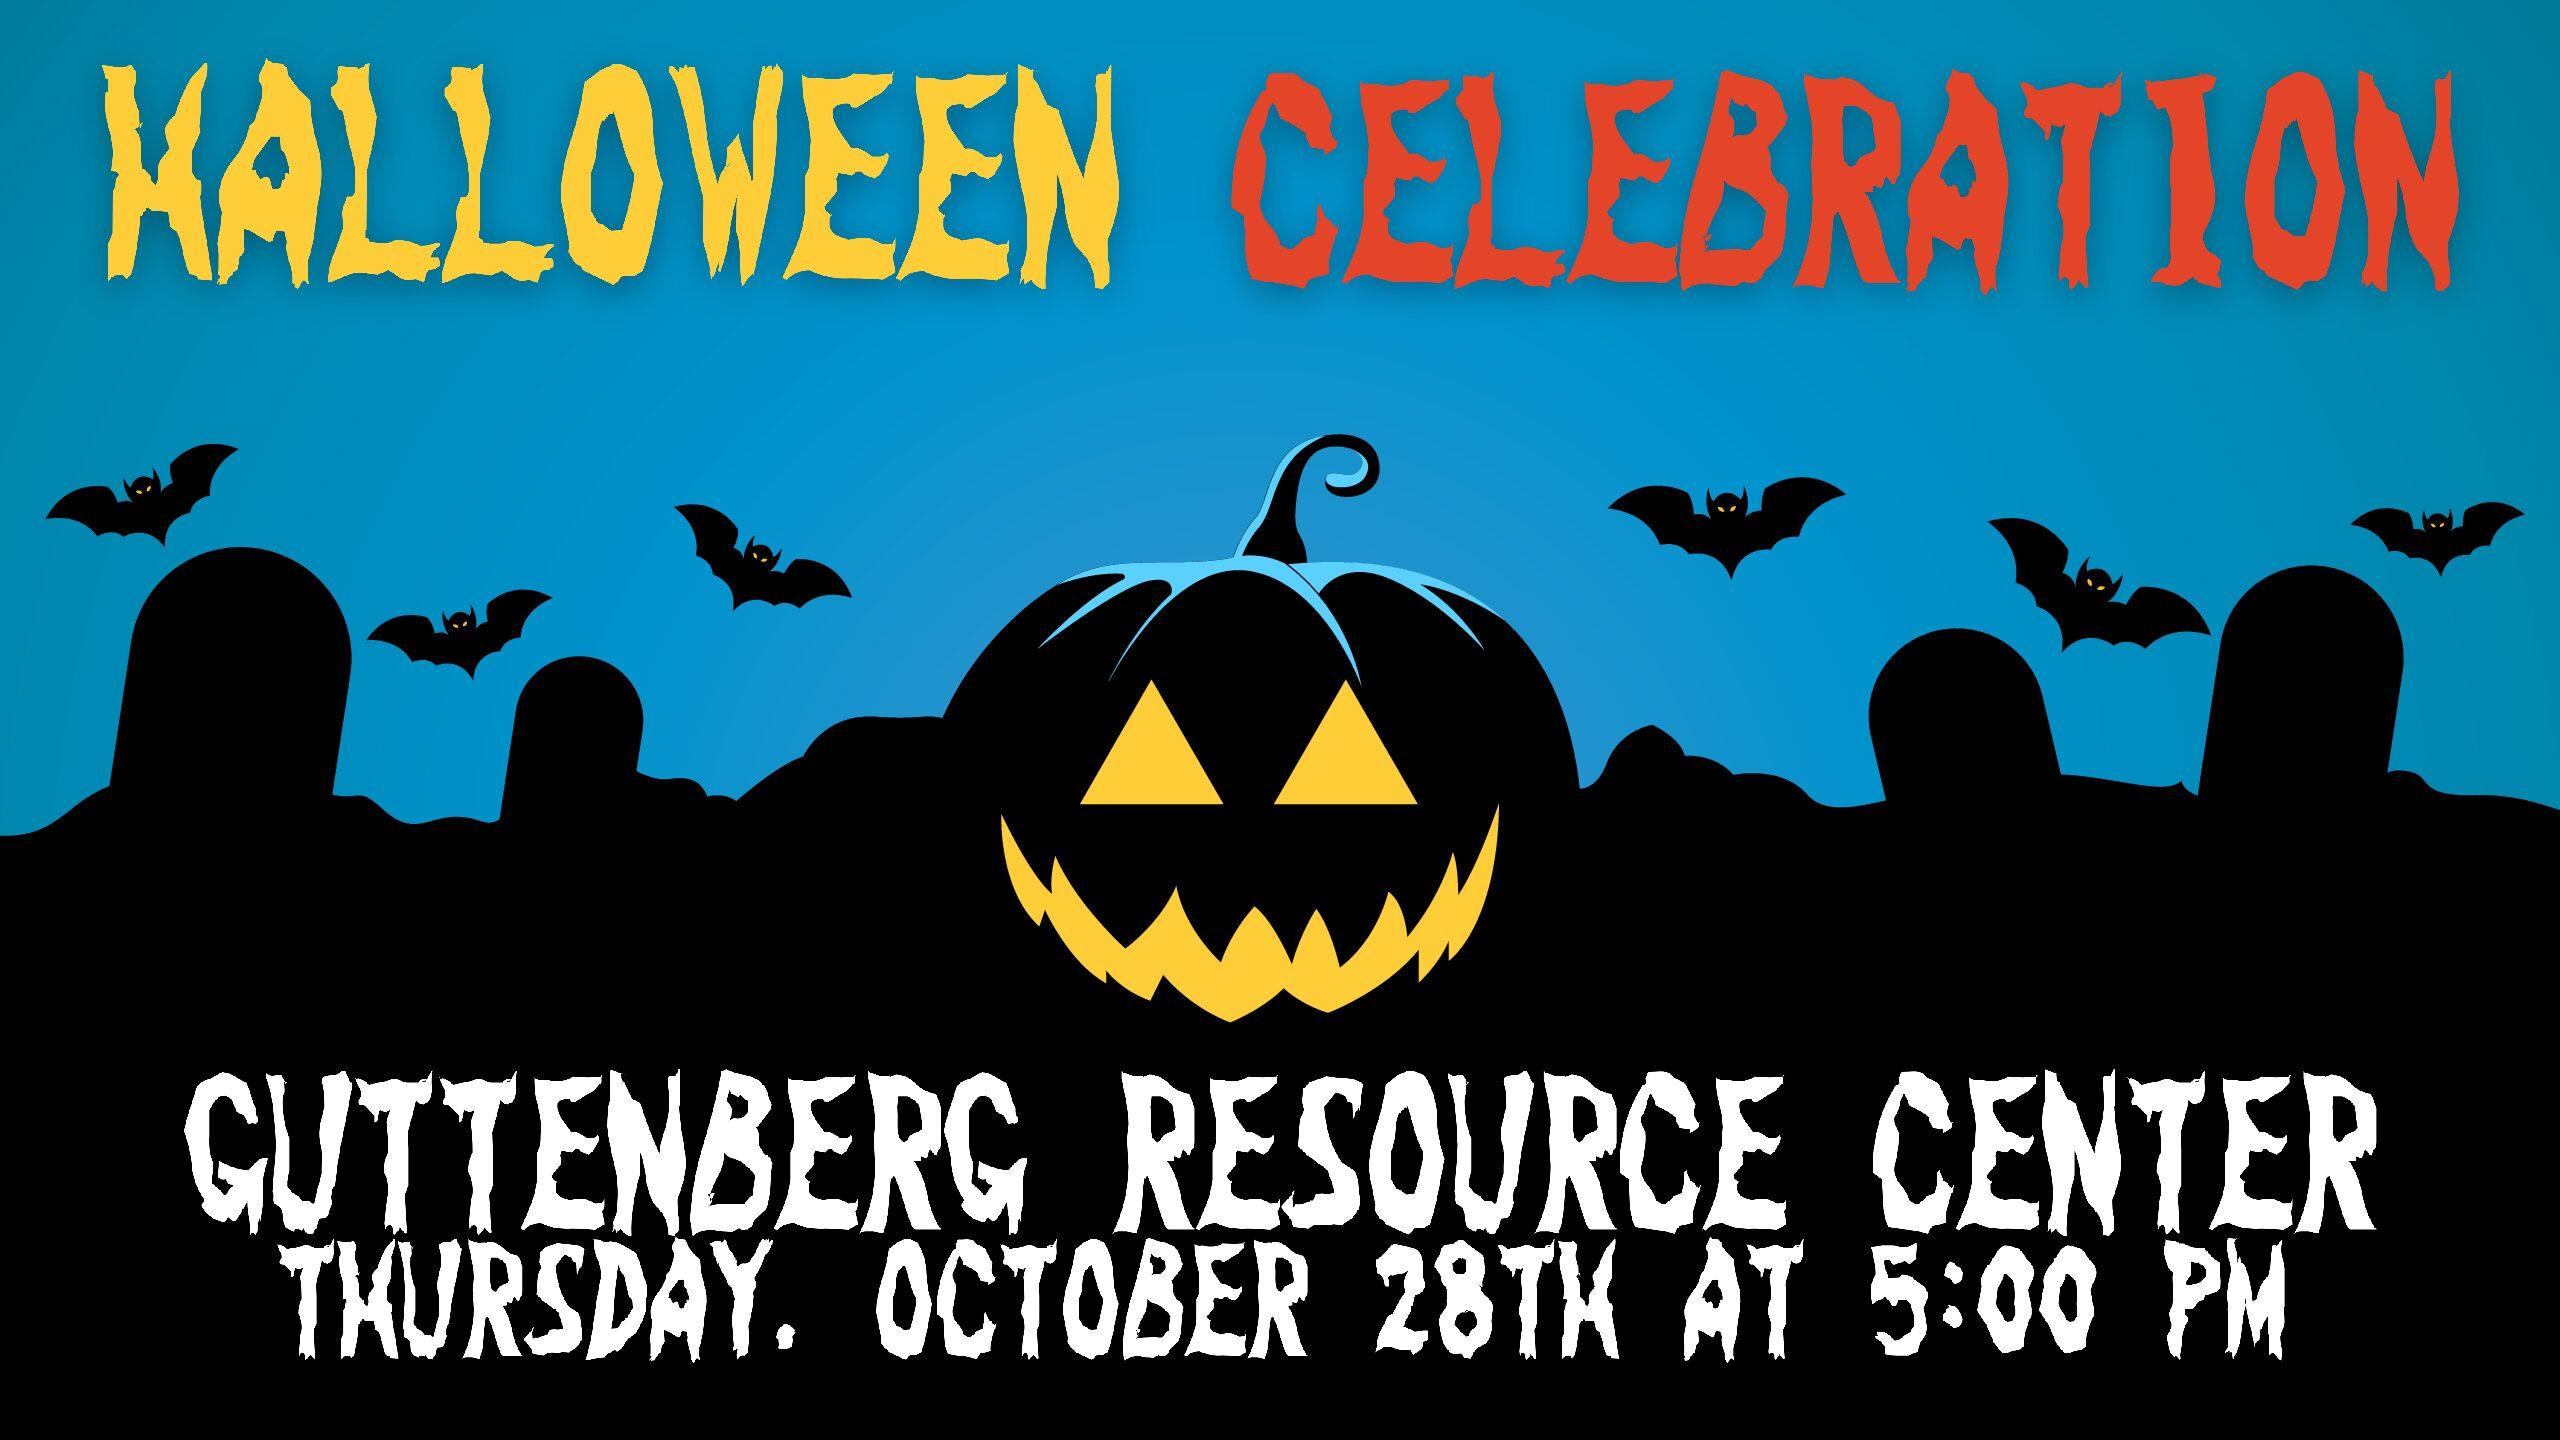 Halloween Celebration – Guttenberg Resource Center